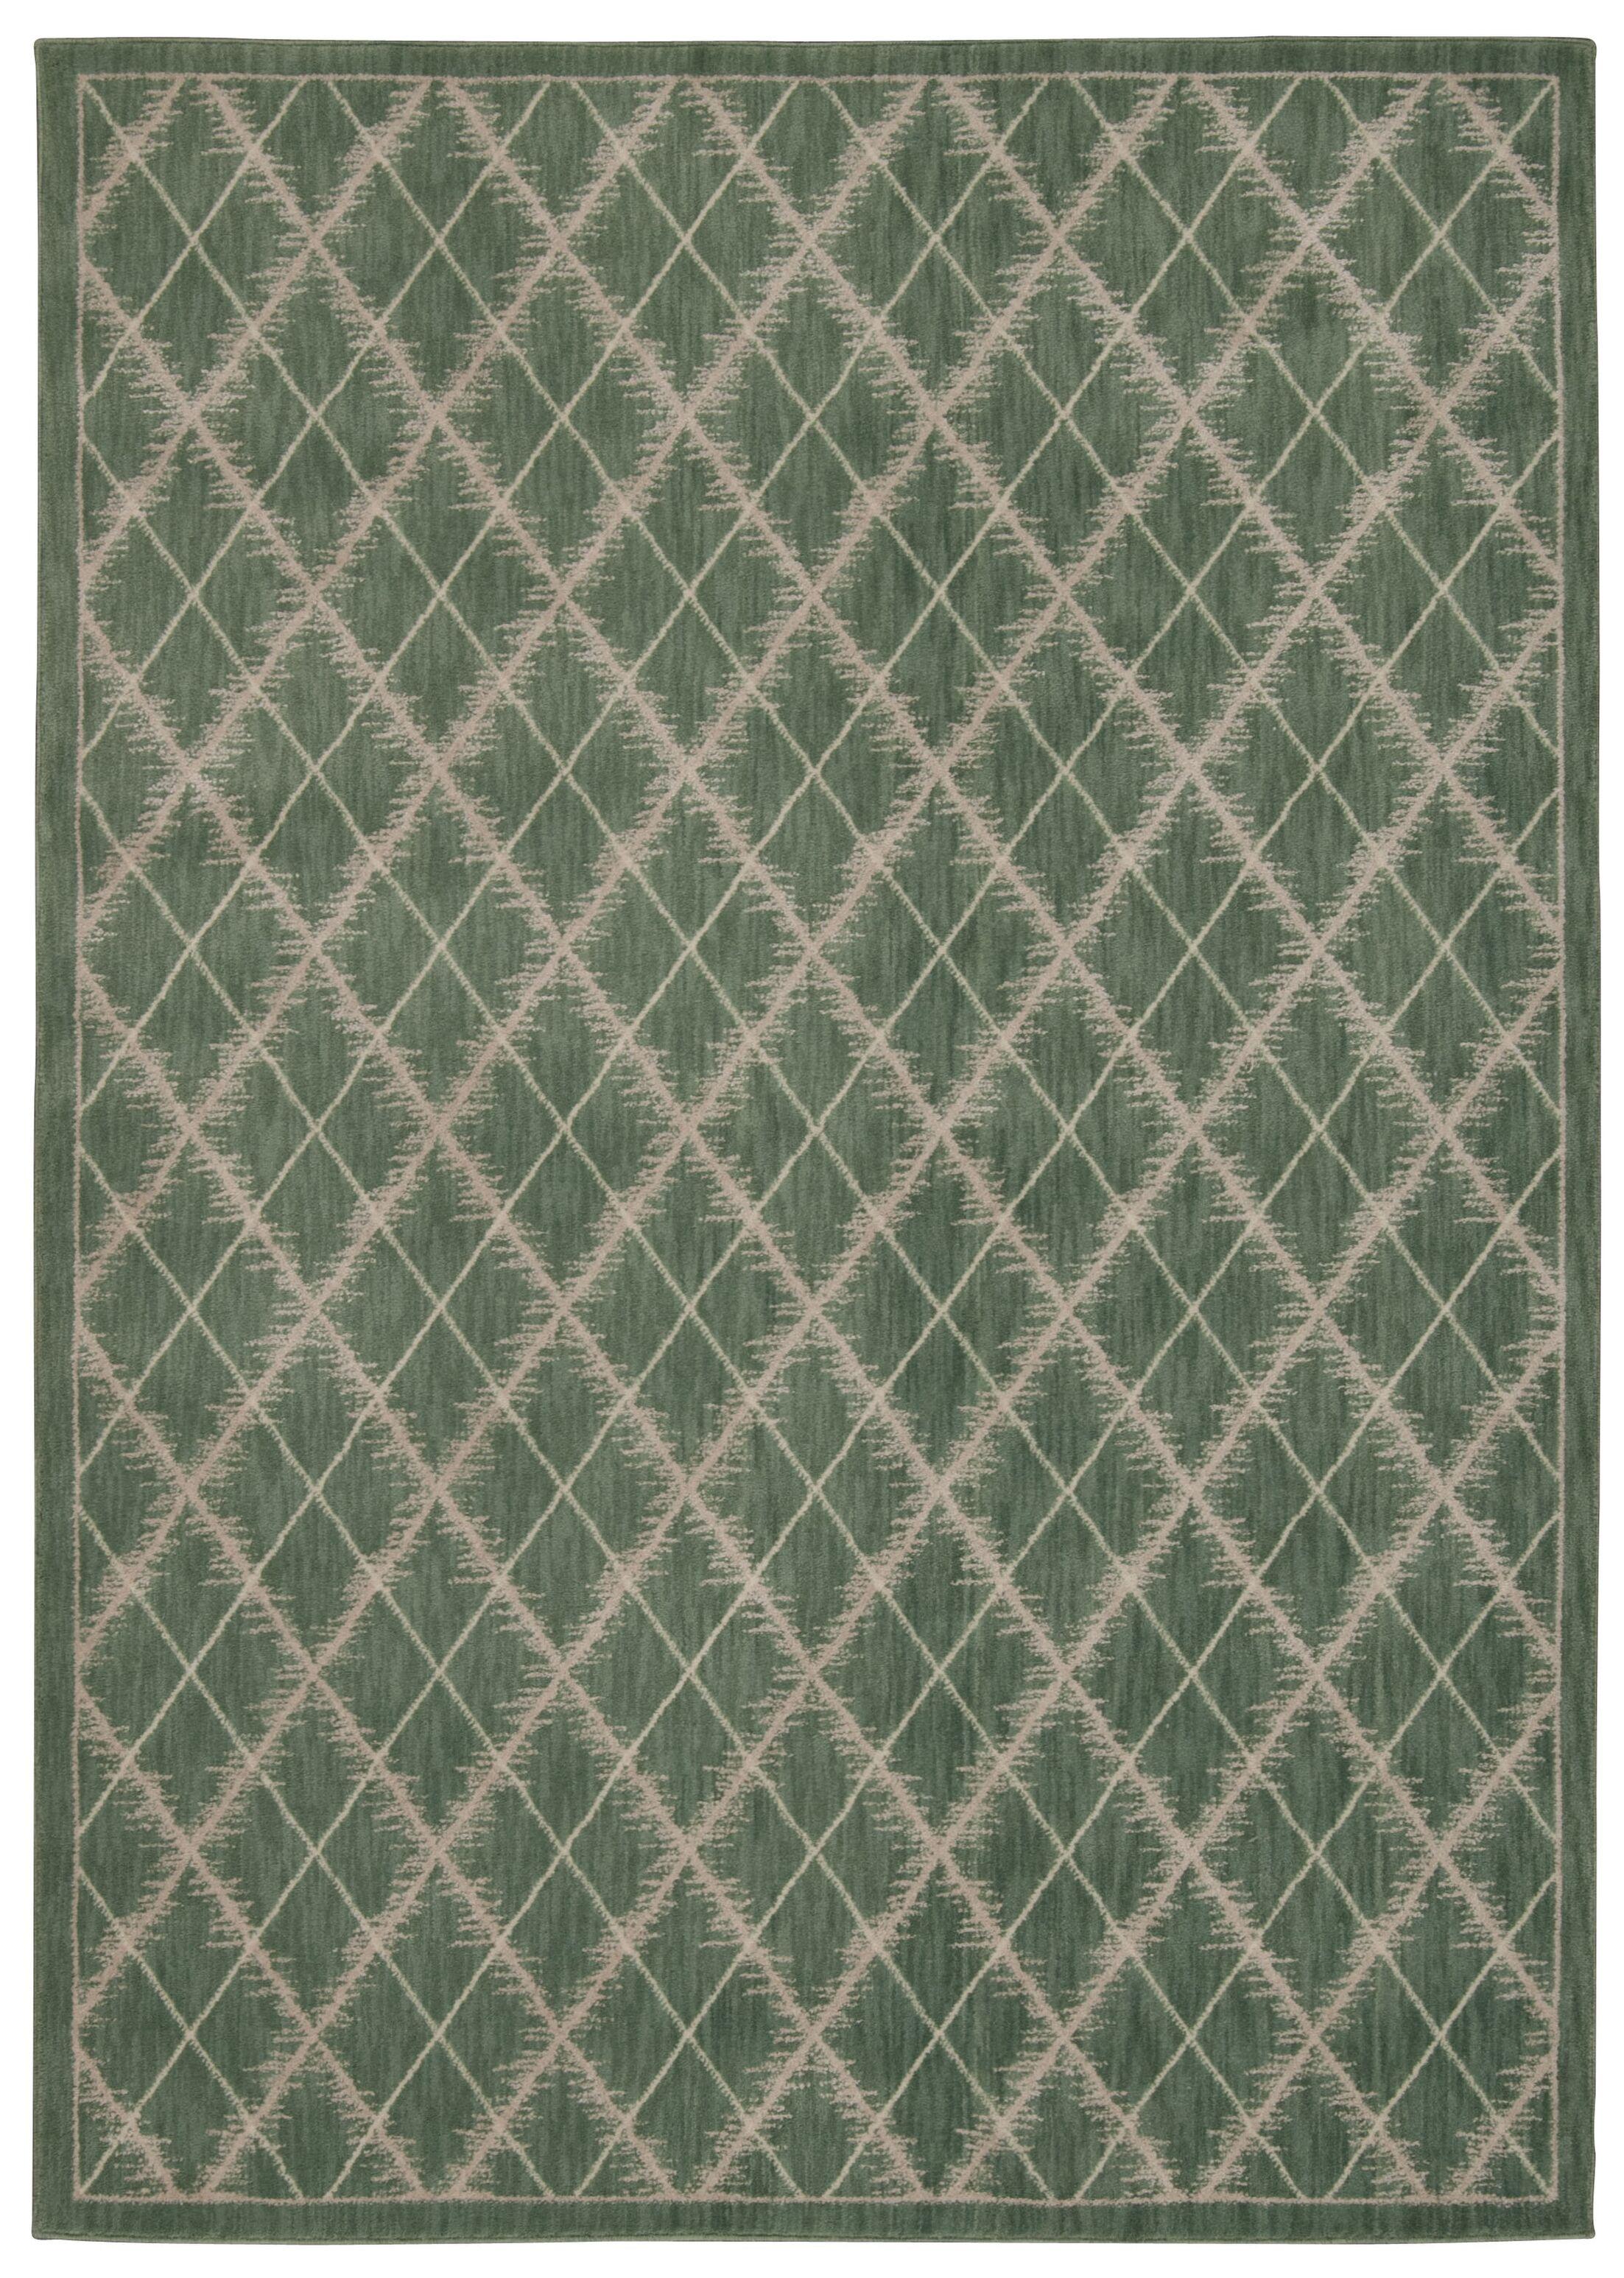 Galsworthy Light Green Area Rug Rug Size: Rectangle 5'3